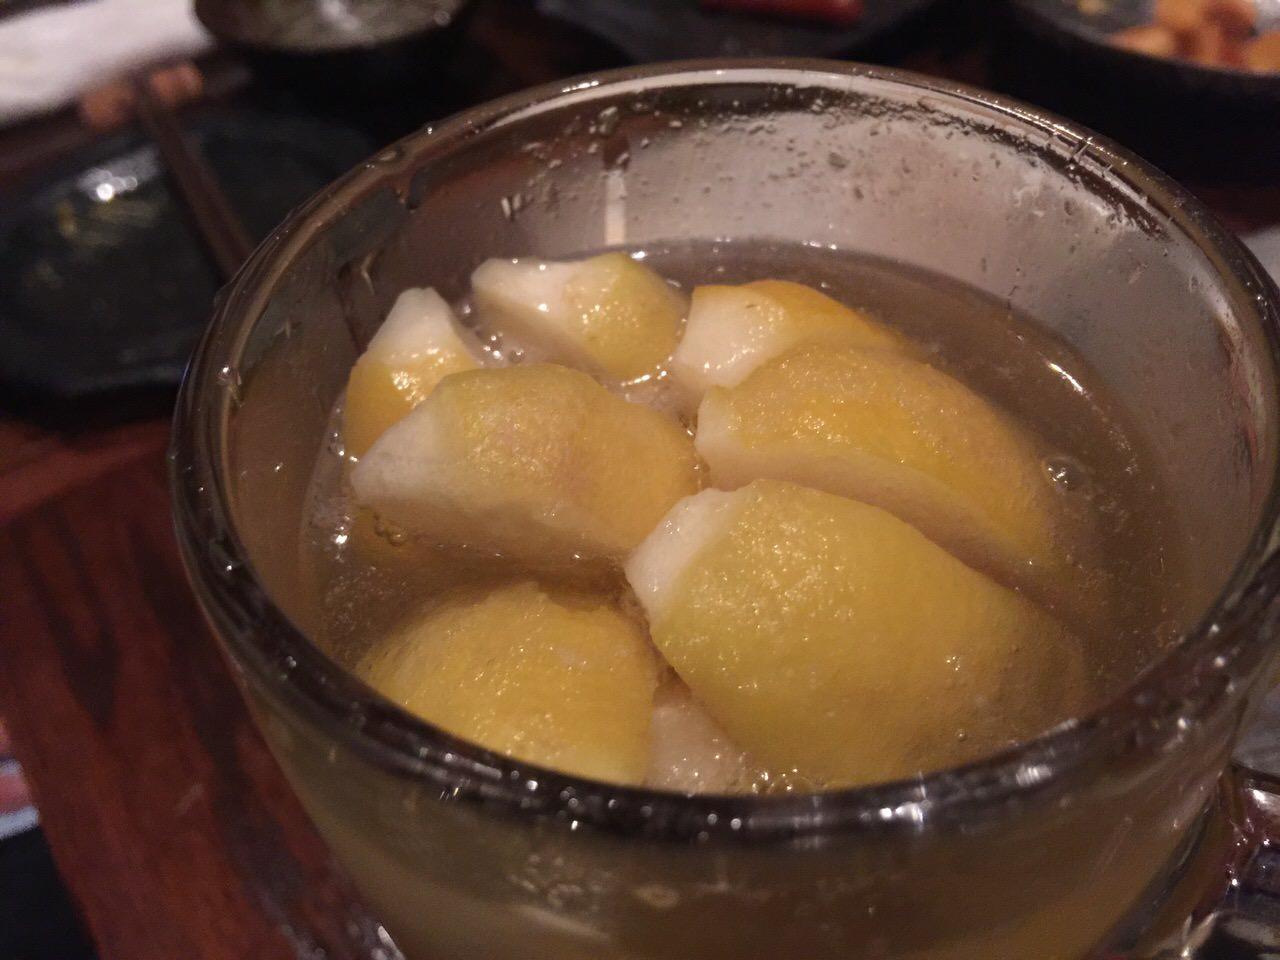 Jim ball lemon 2267